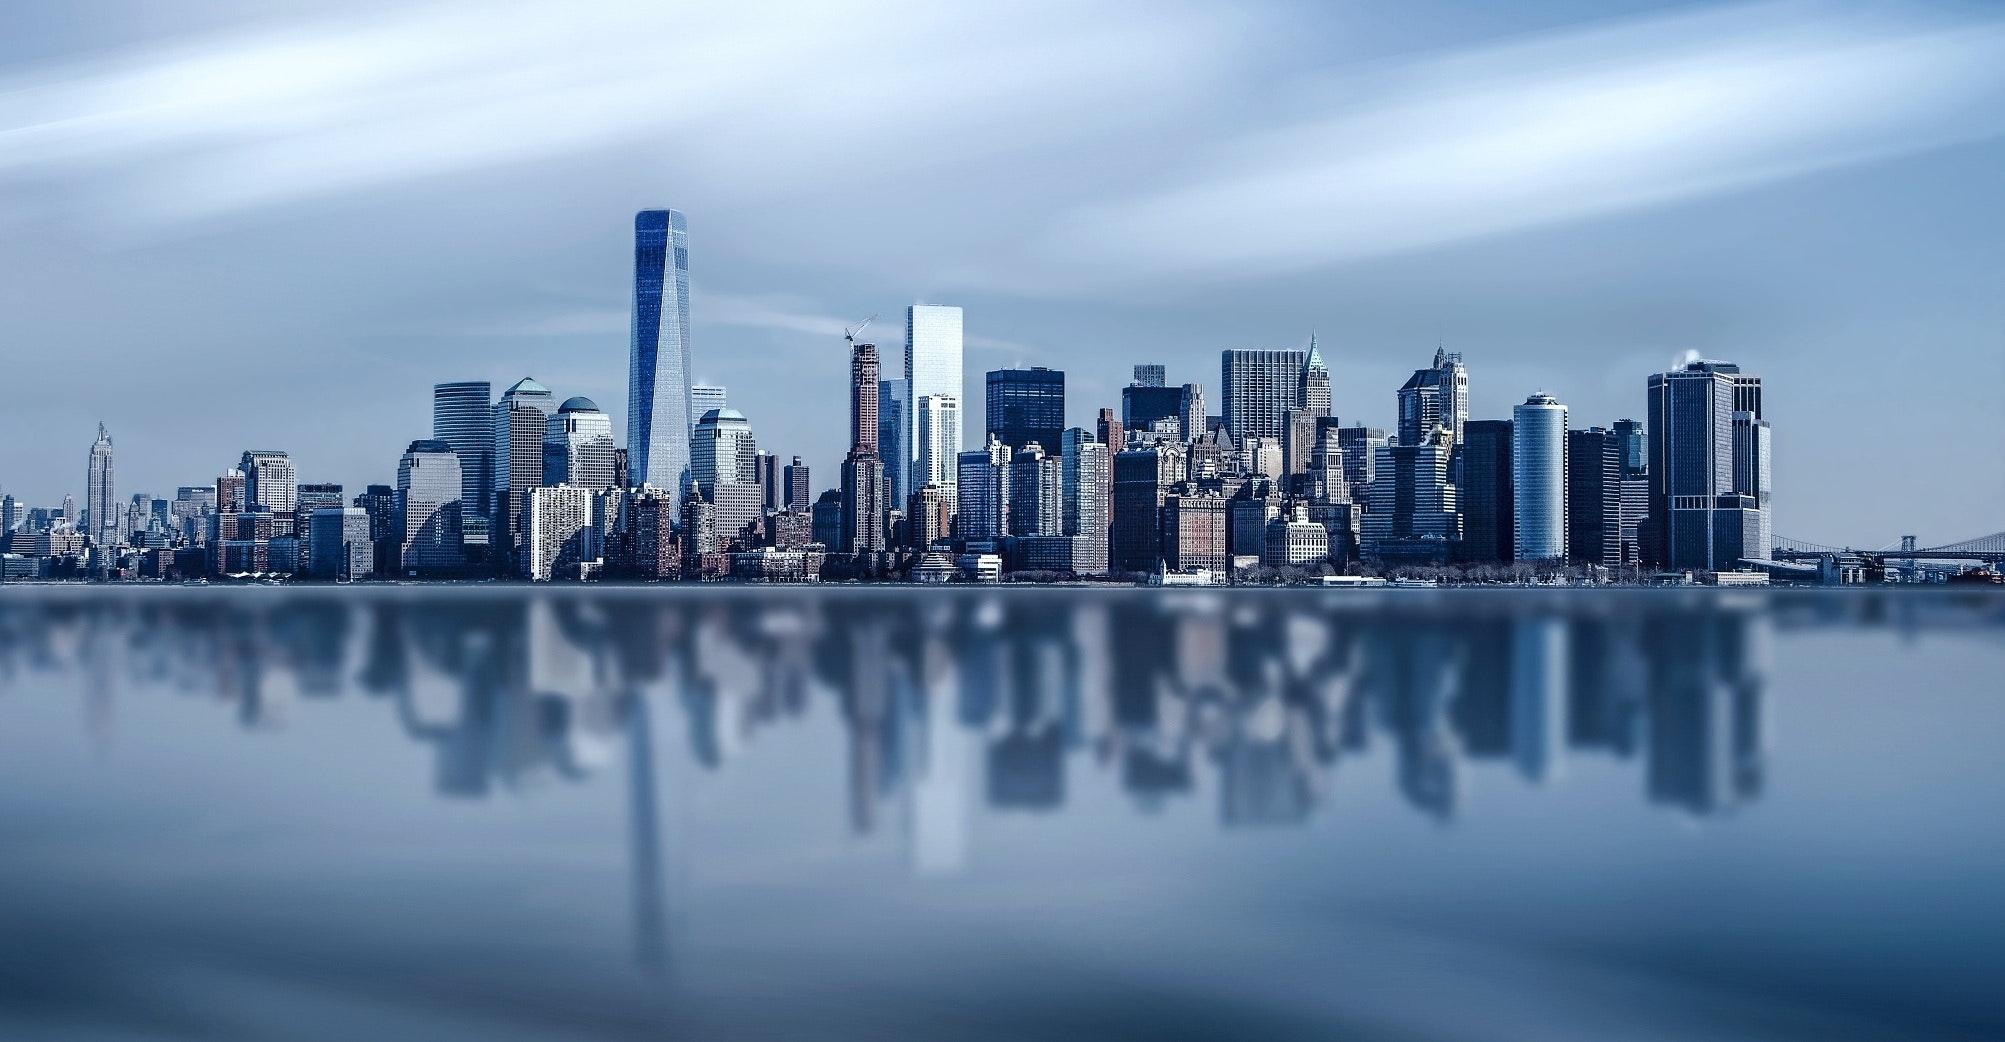 City pictures · Pexels · Free Stock Photos